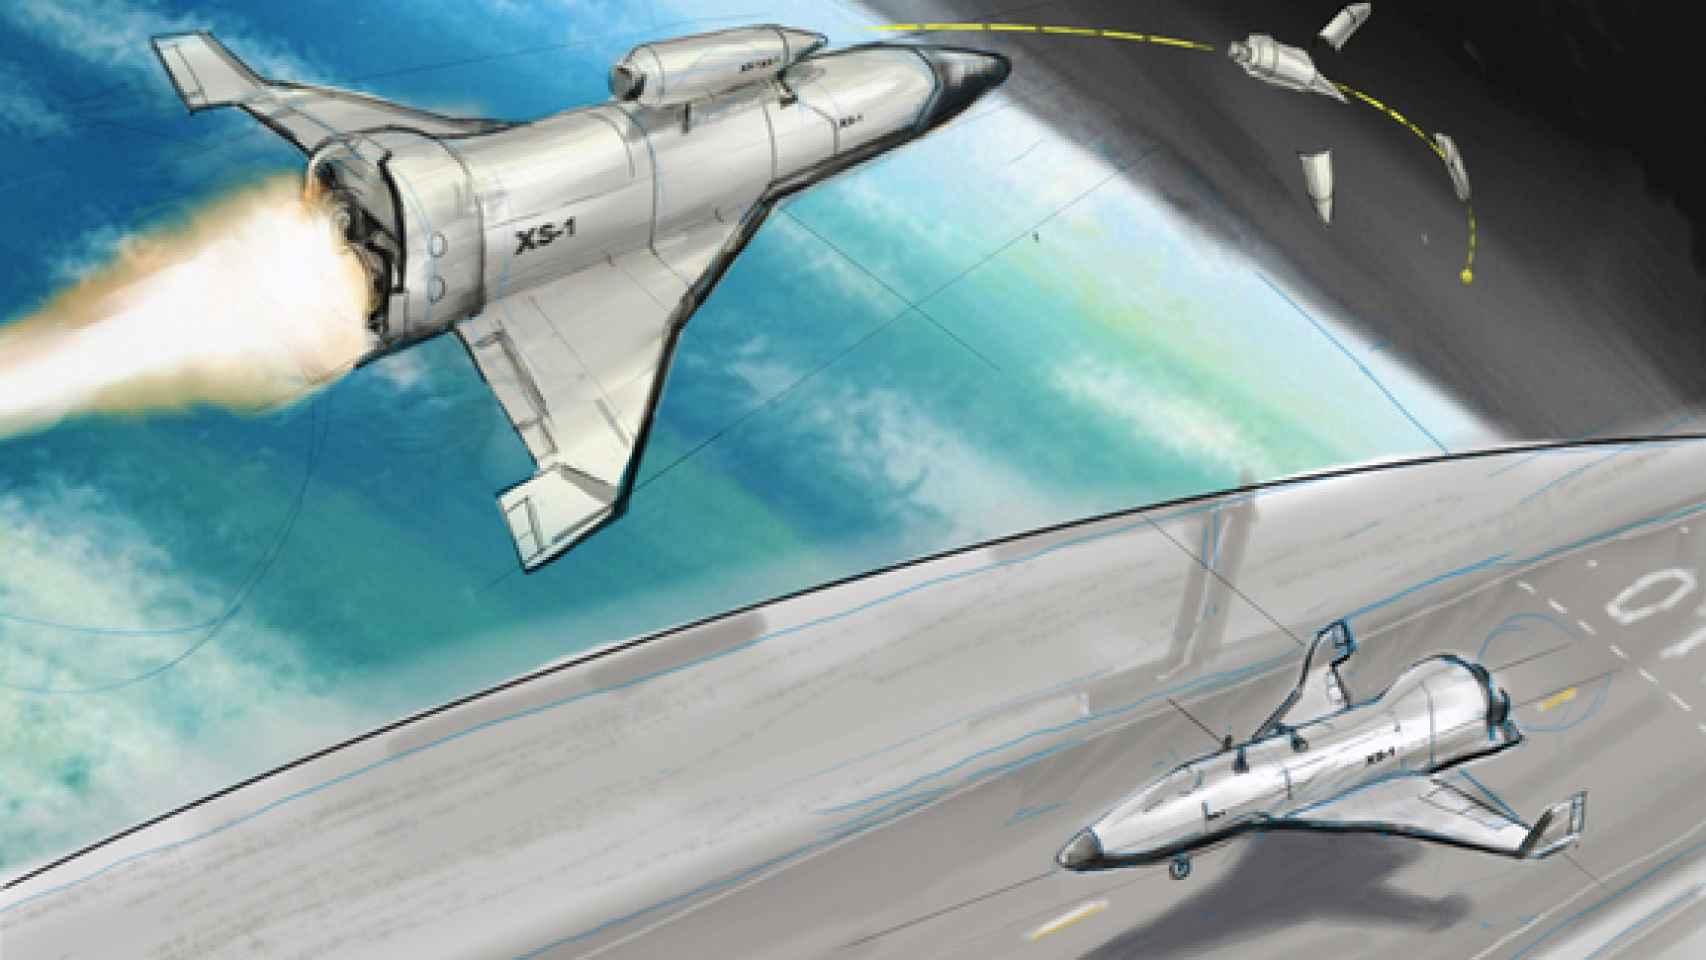 darpa-space-plane-xs1